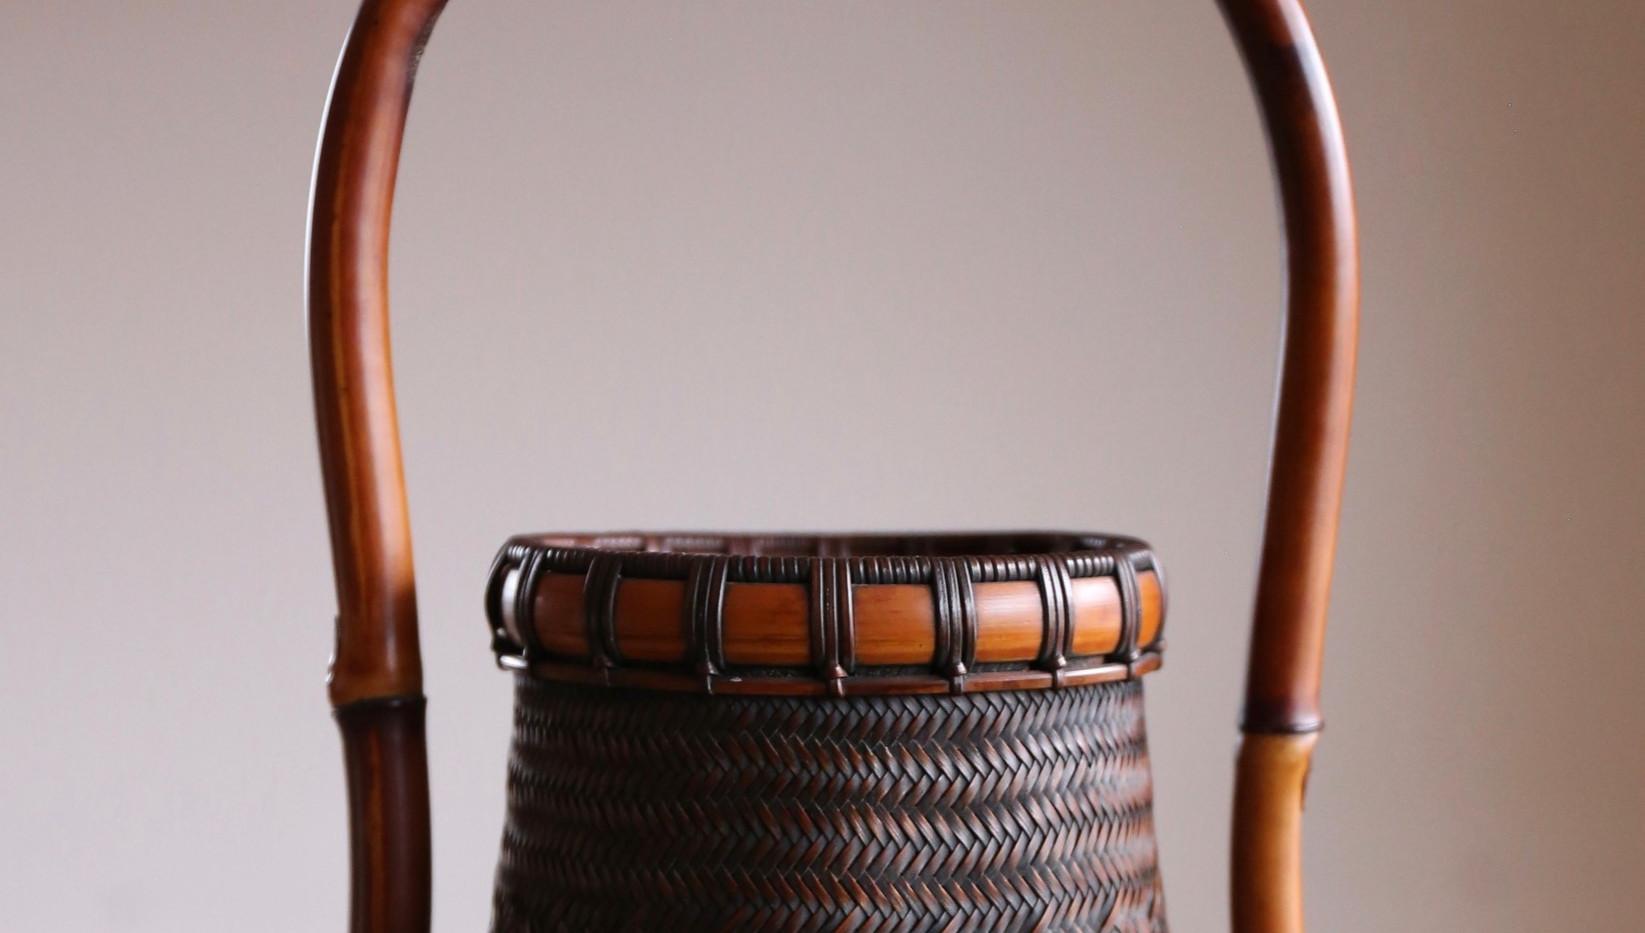 Kosuge Kogetsu Eggplant-basket 05.jpg